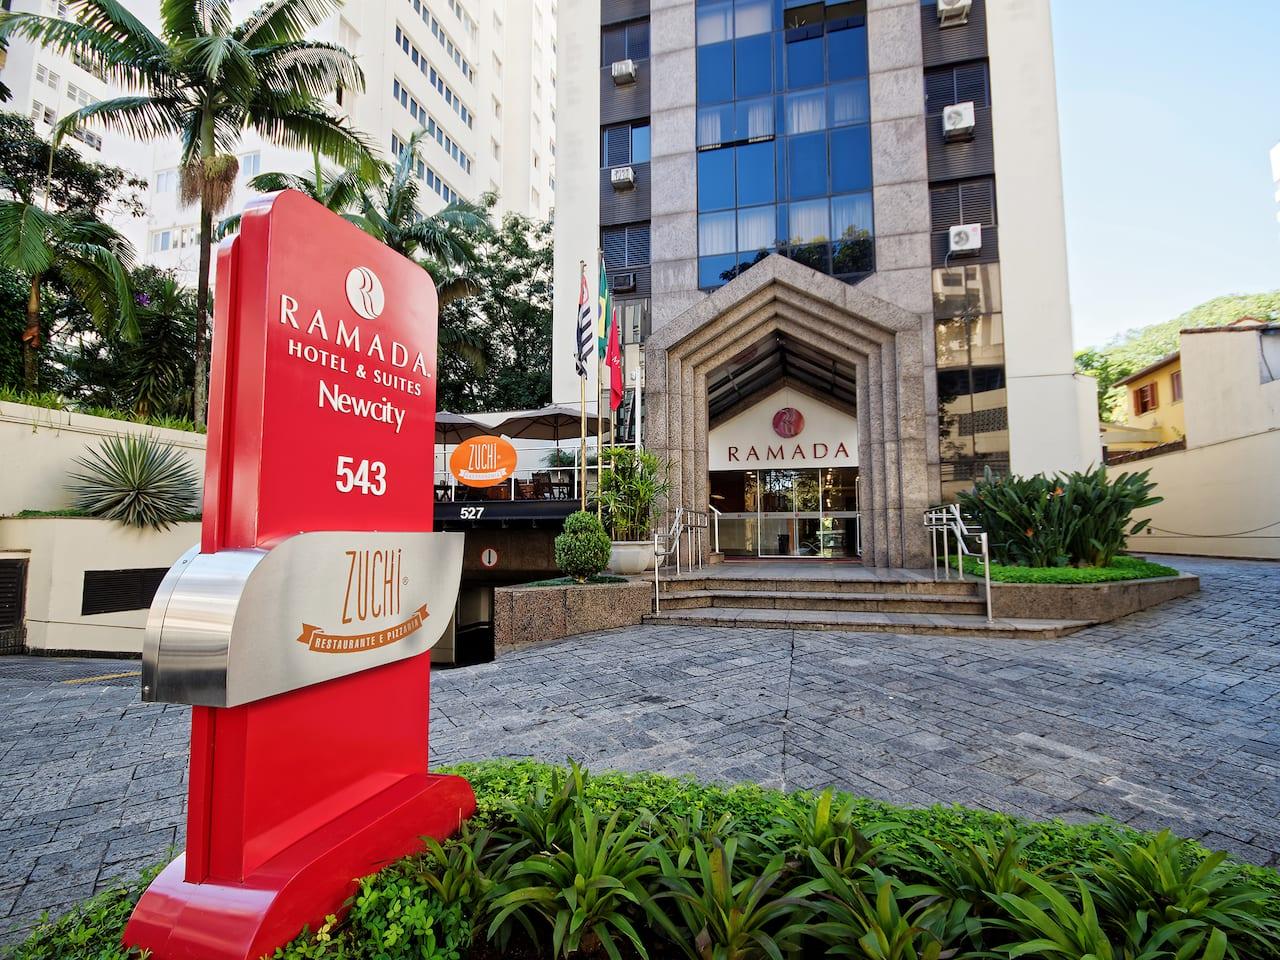 Ramada Suites Sao Paulo Itaim Bibi Newciti in Sao Paulo, BRAZIL